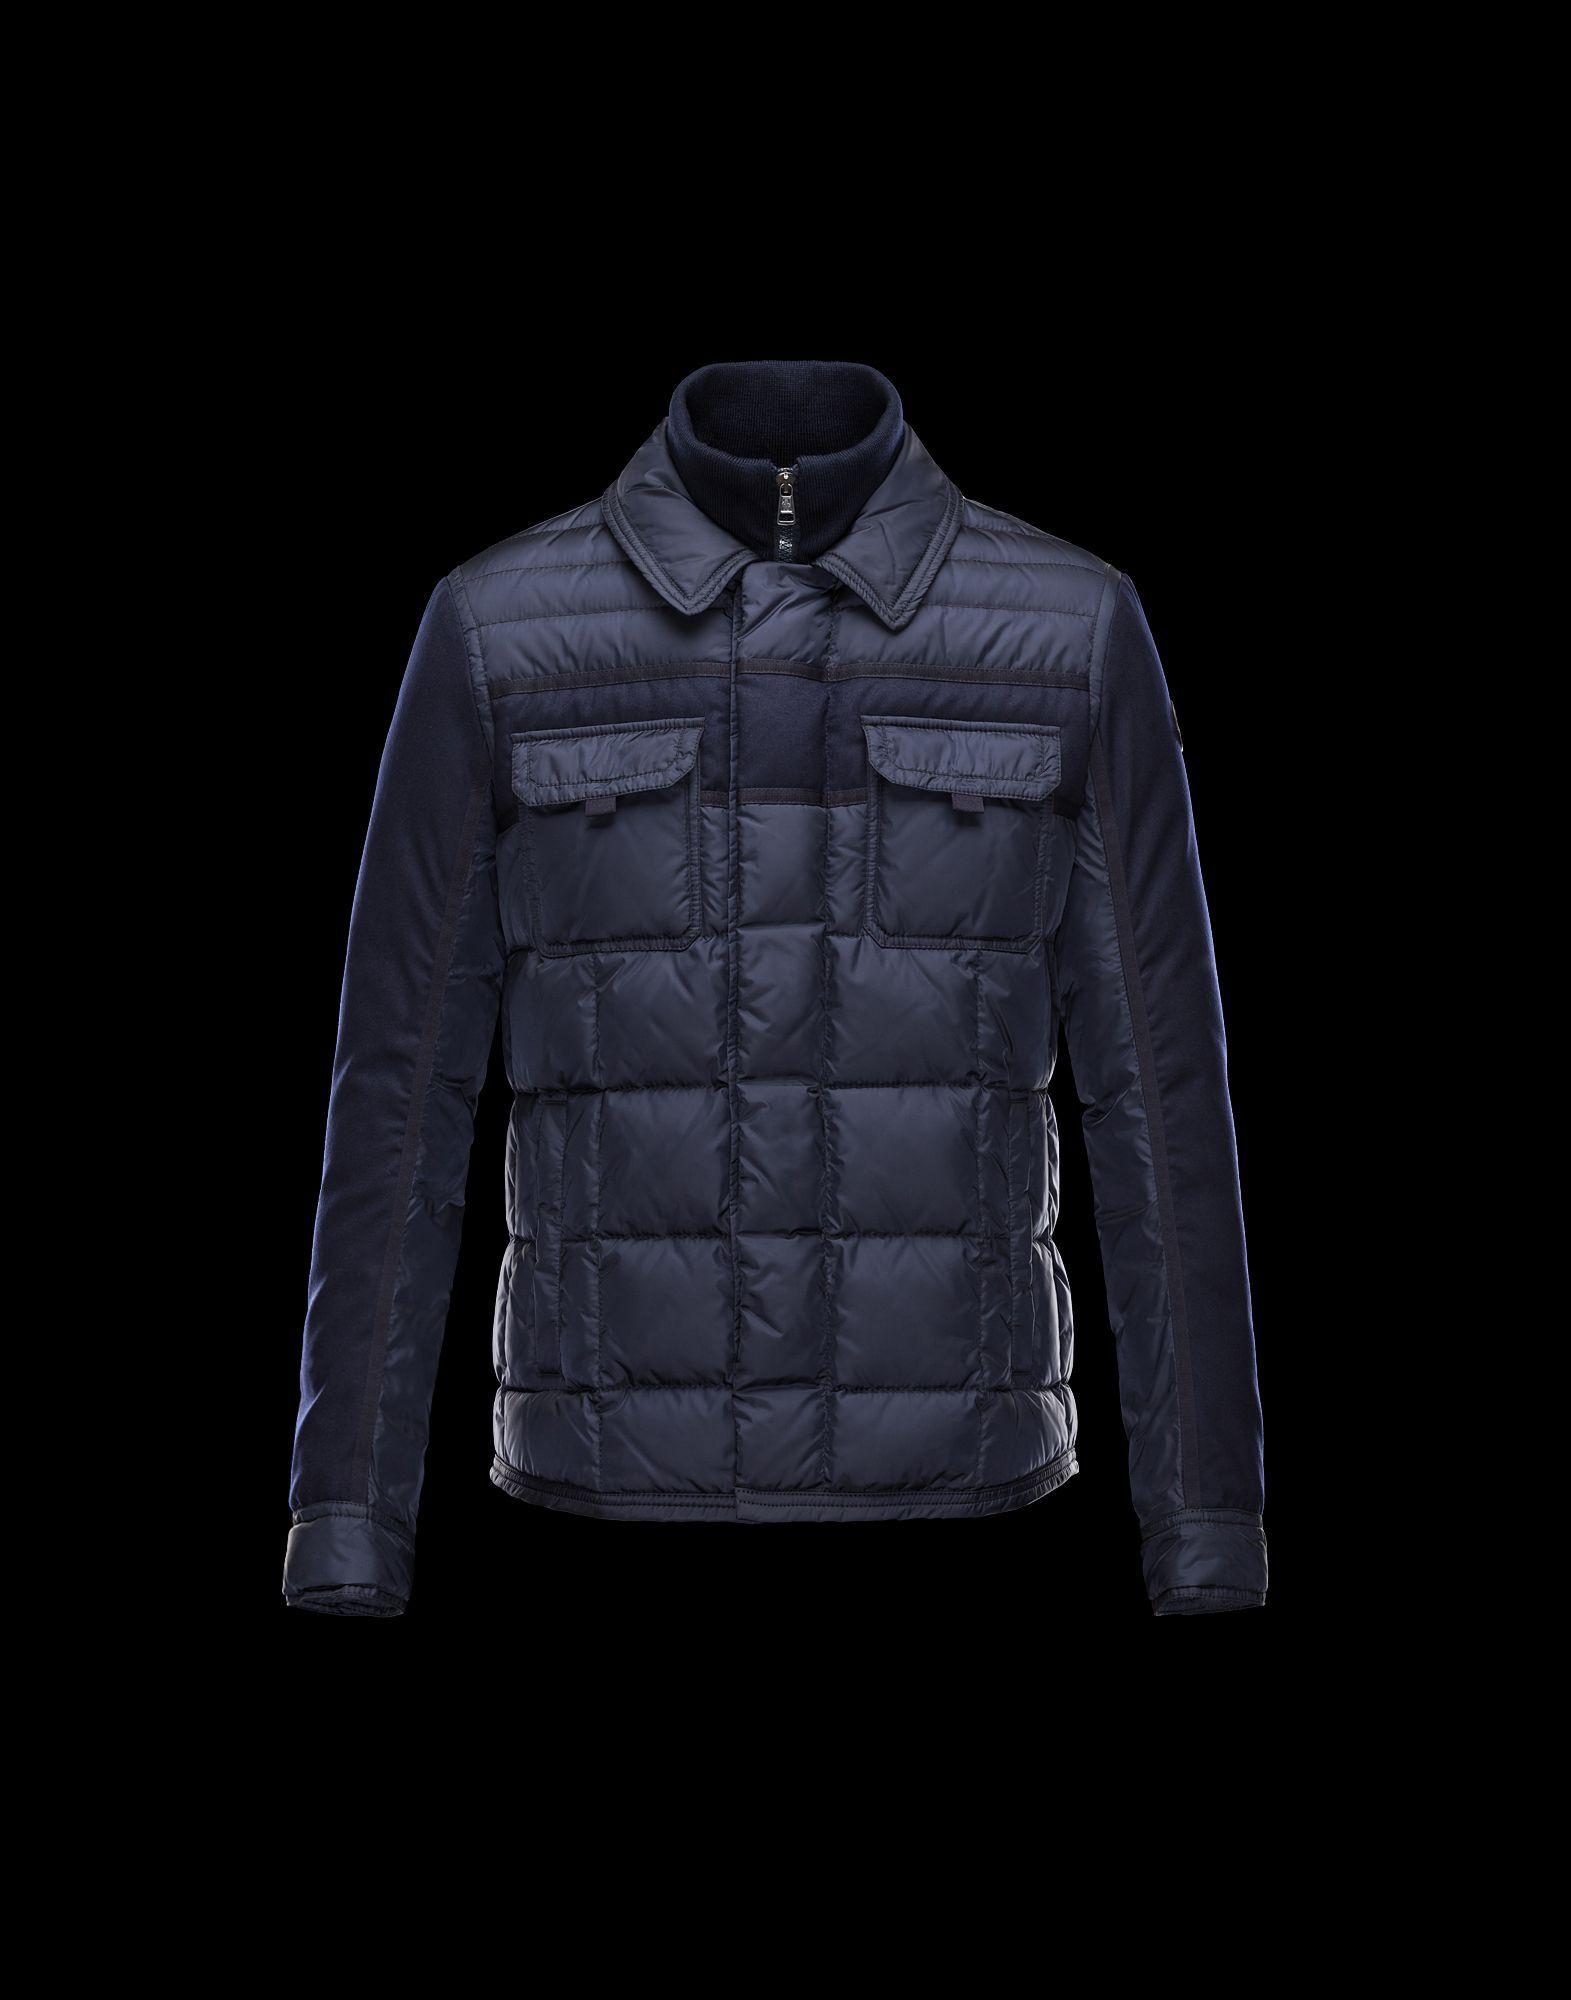 0b5d80f33718 Jacket Men - Outerwear Men on Moncler Online Store